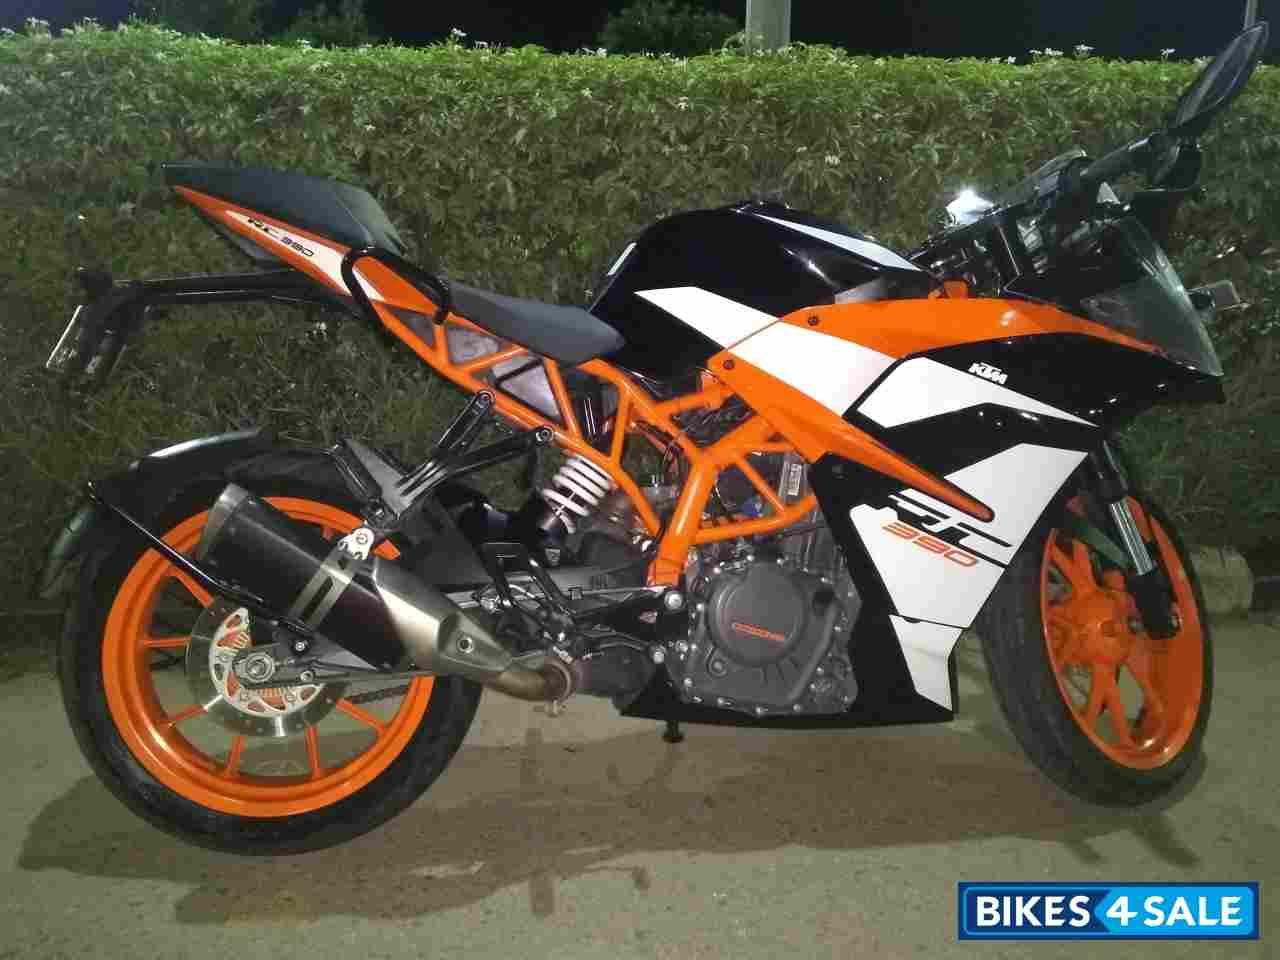 Black Orange White Ktm Rc 390 Picture 1 Bike Id 278363 Bike Located In Bangalore Bikes4sale